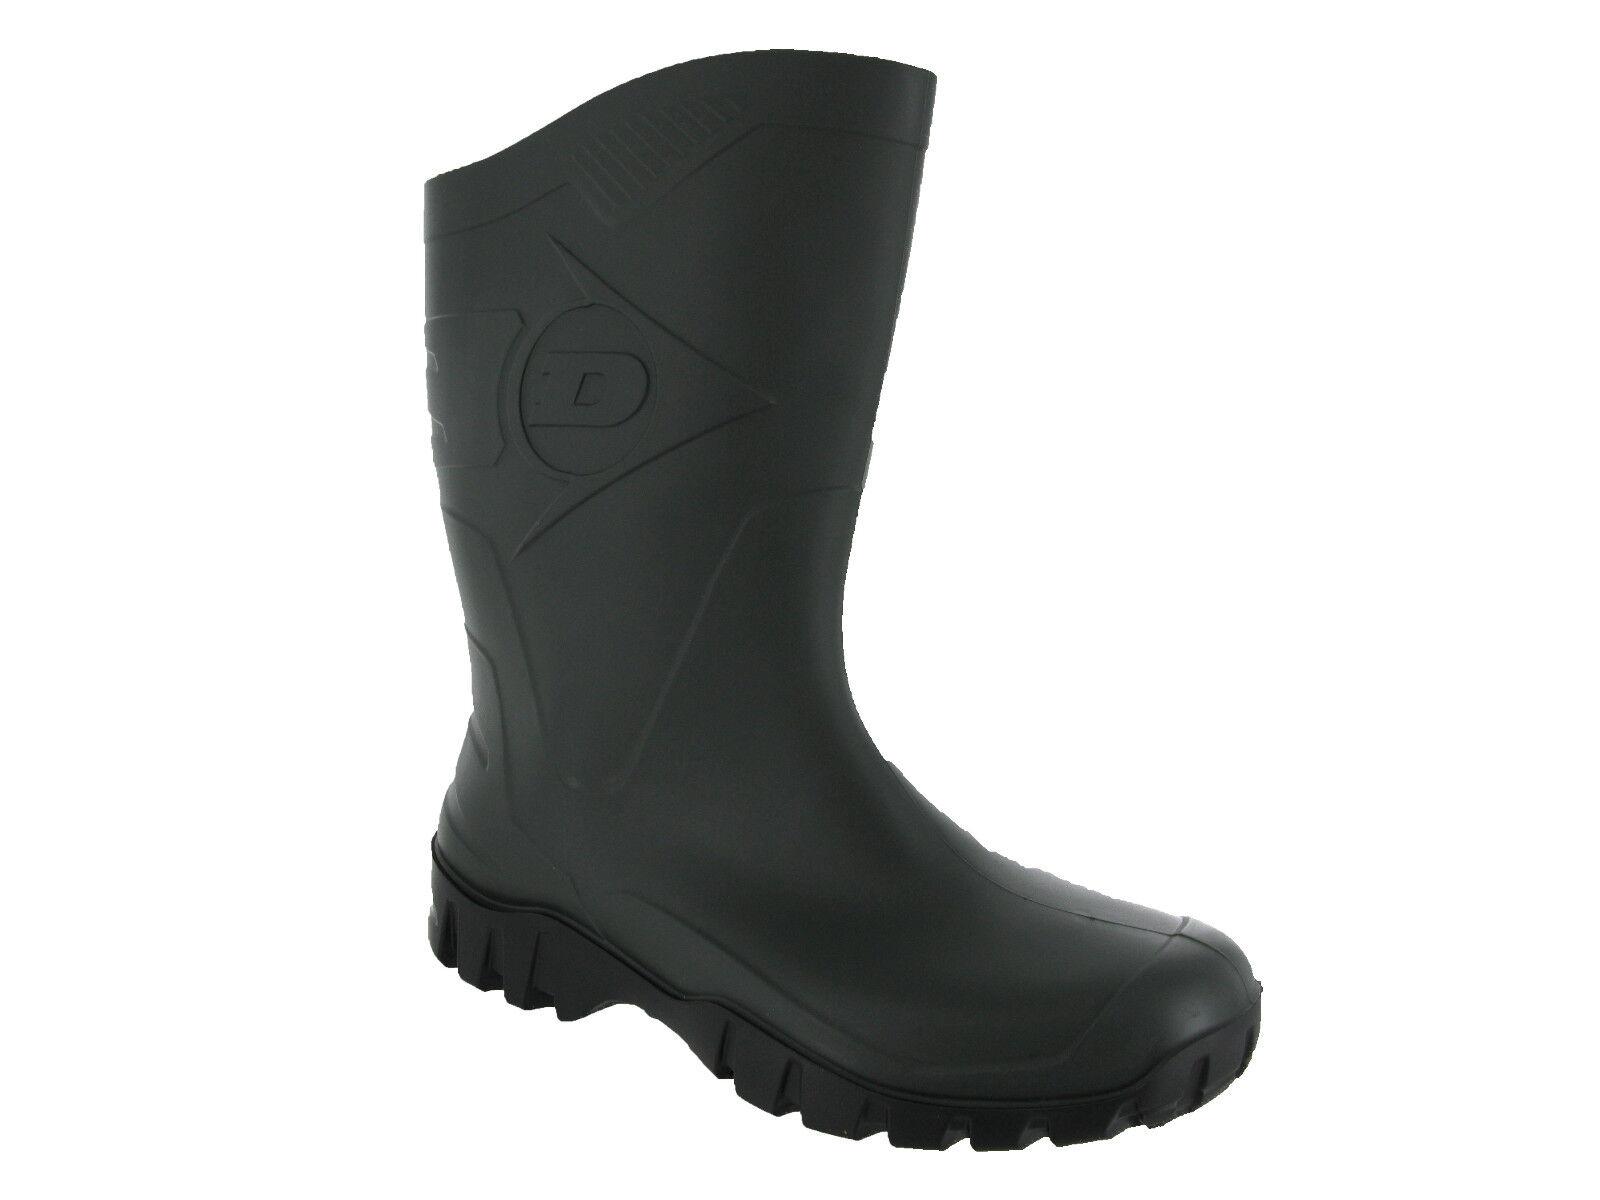 Dunlop Wide Calf Unisex  Herren Damenschuhe Wellingtons Stiefel Stiefel Stiefel Wellies UK4 12 ... 81886e